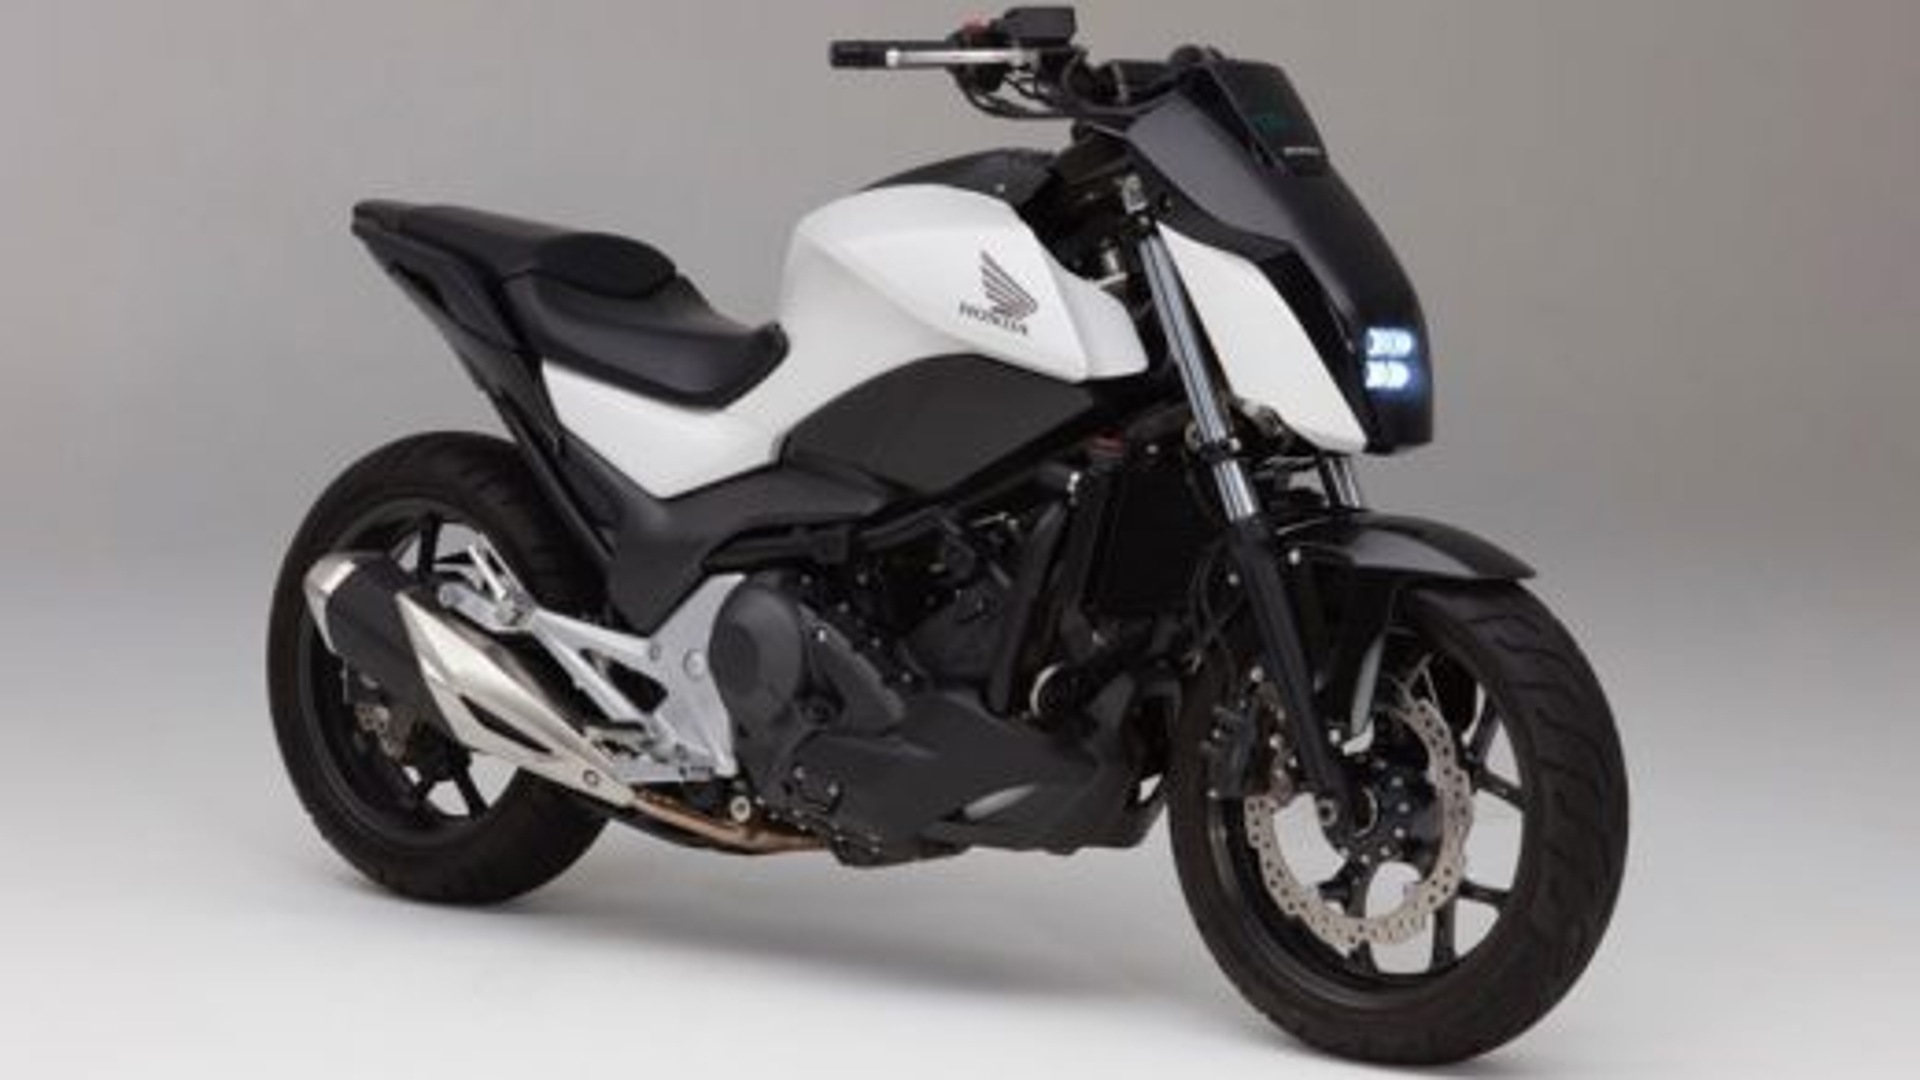 موتور سیکلت هوندا | تگ